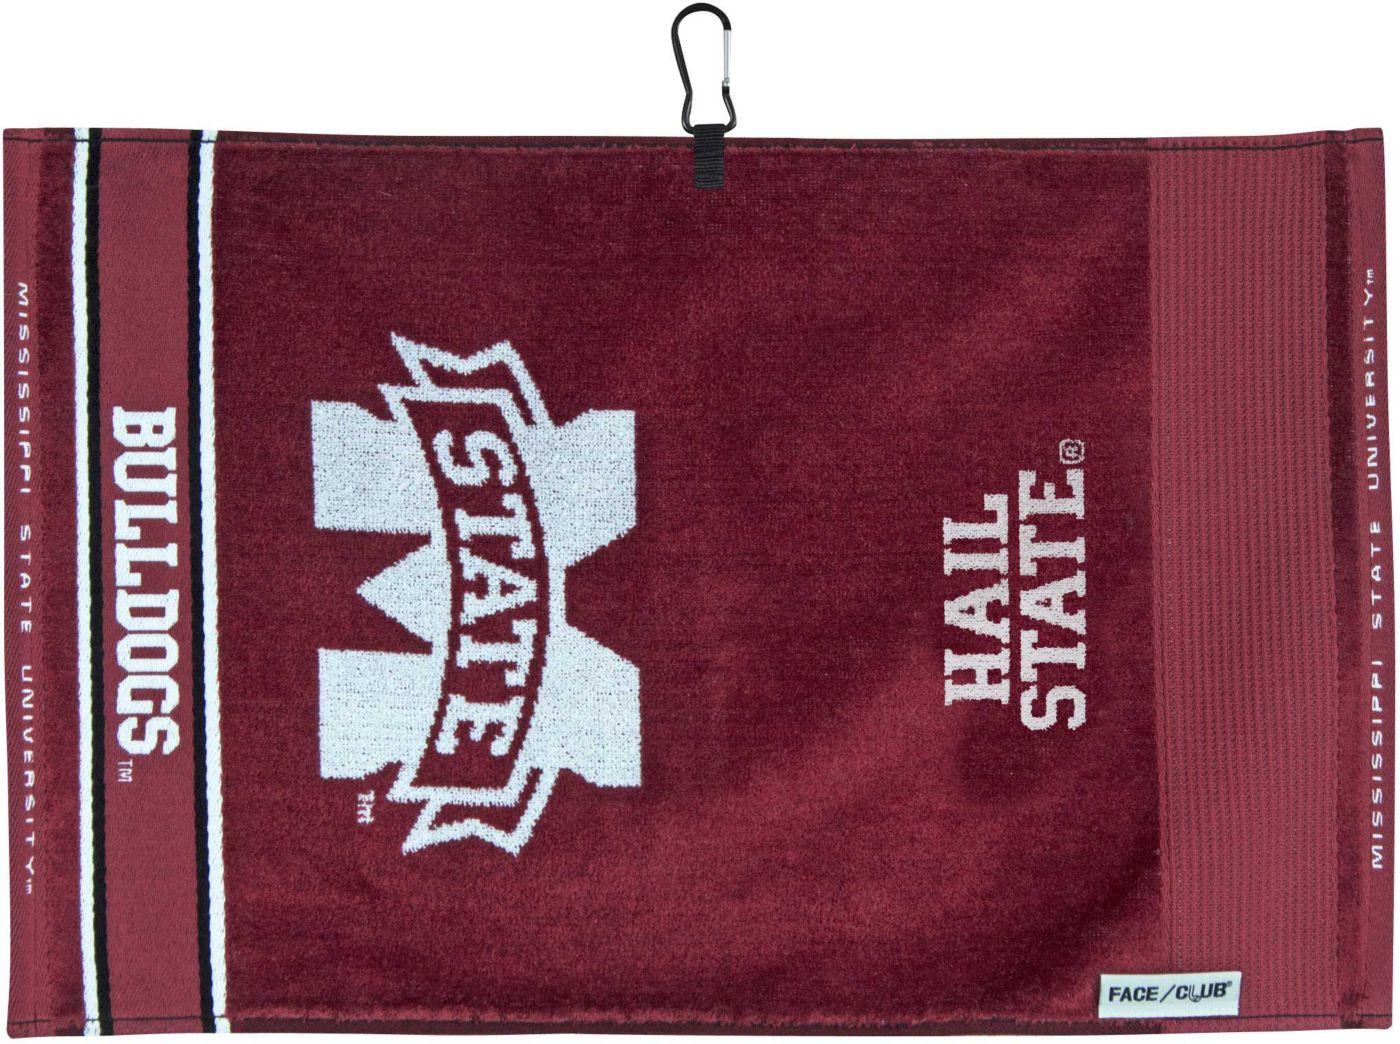 Team Effort Mississippi State Bulldogs Face/Club Jacquard Golf Towel